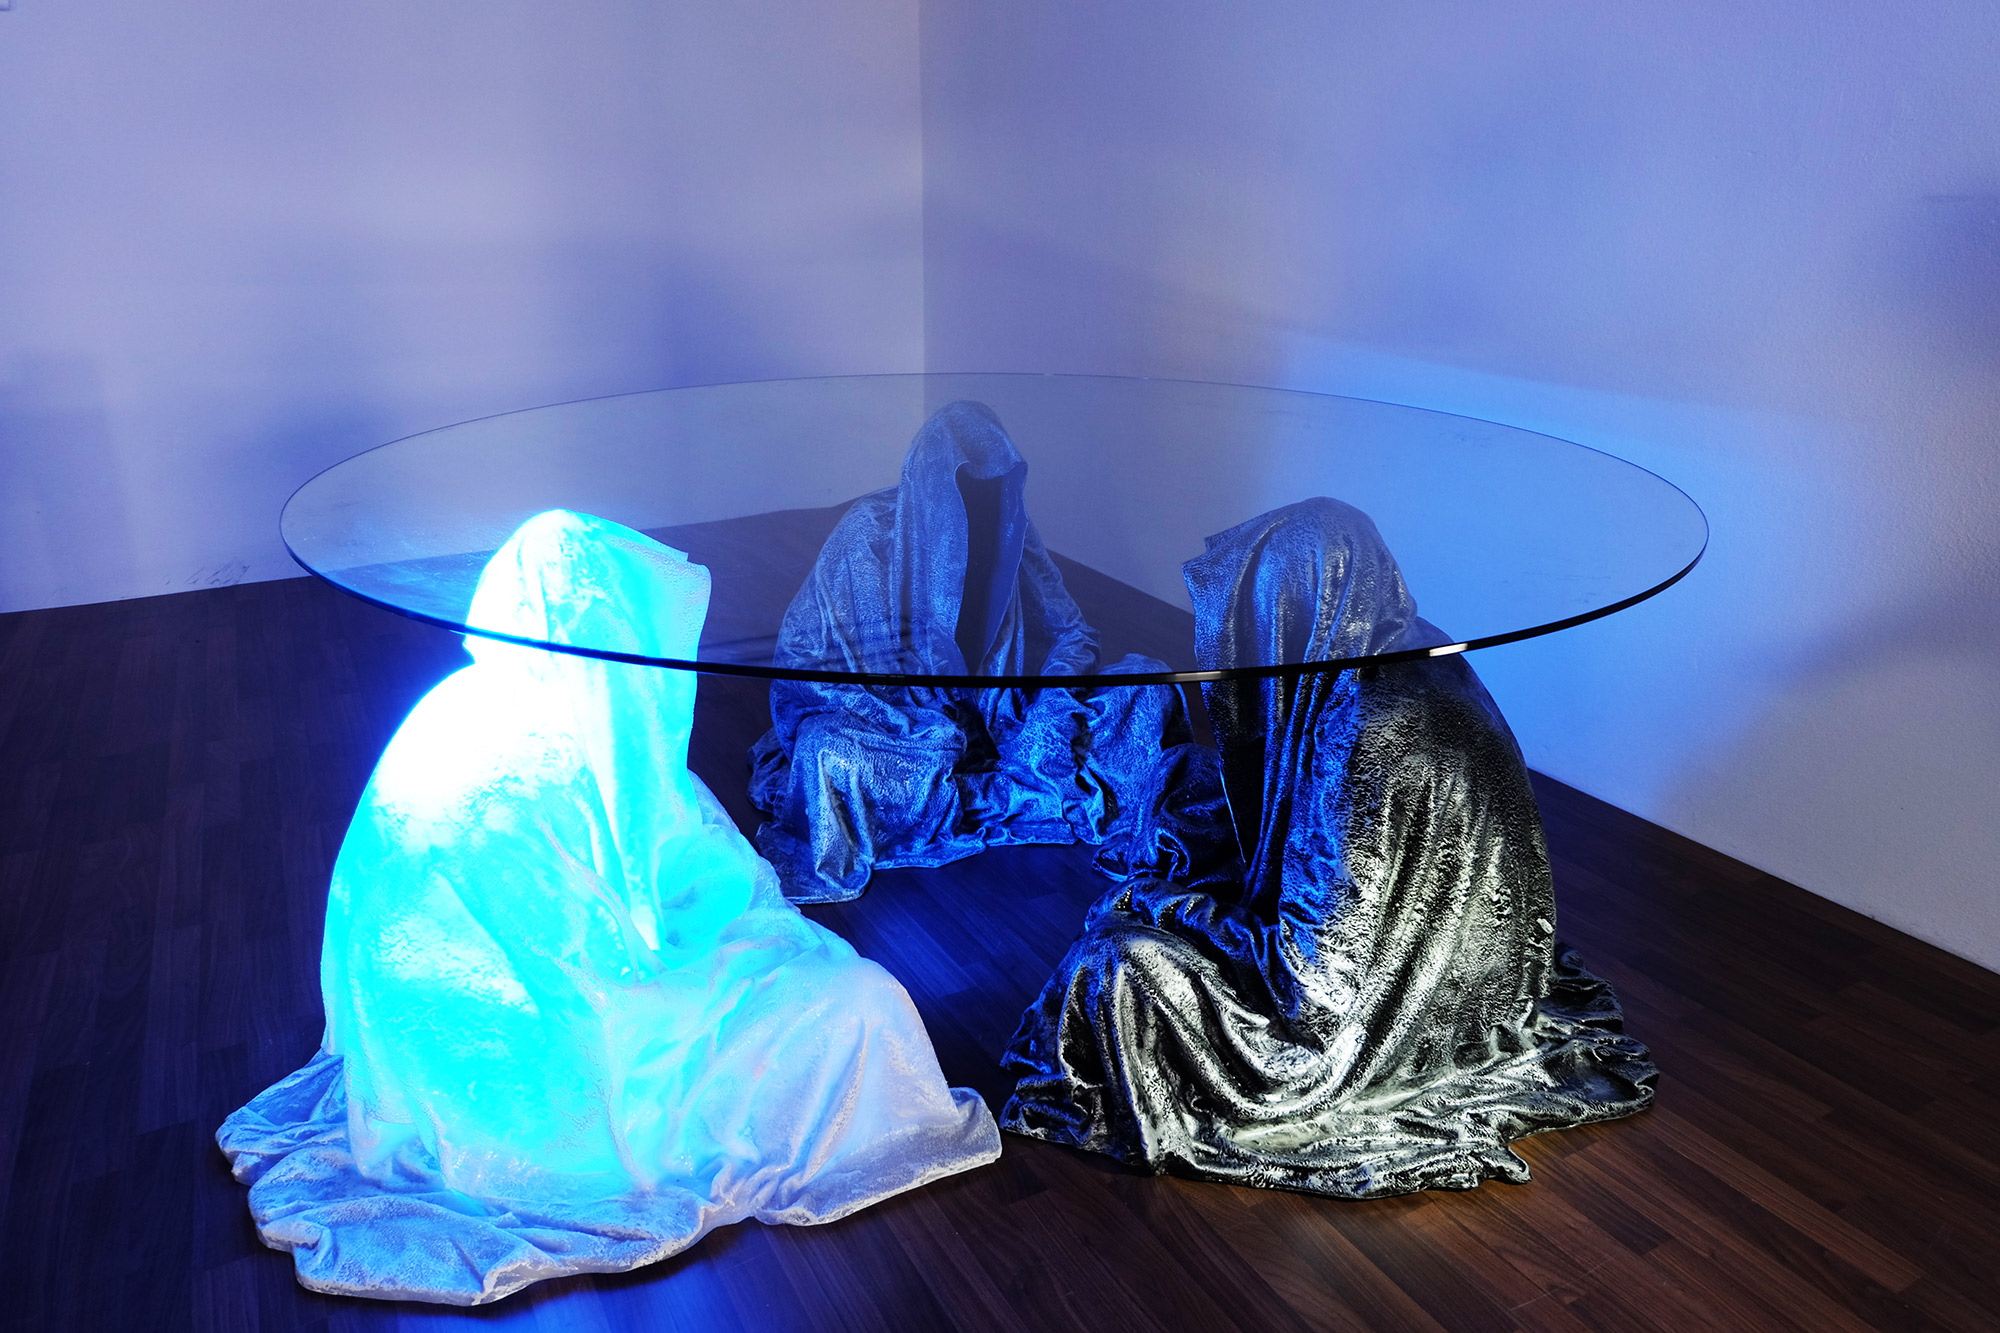 exclusive-furniture-guardian-table-glass-sculpture-statue-contemporary-light-art-design-antique-fine-art-manfred-kili-kielnhofer-4352